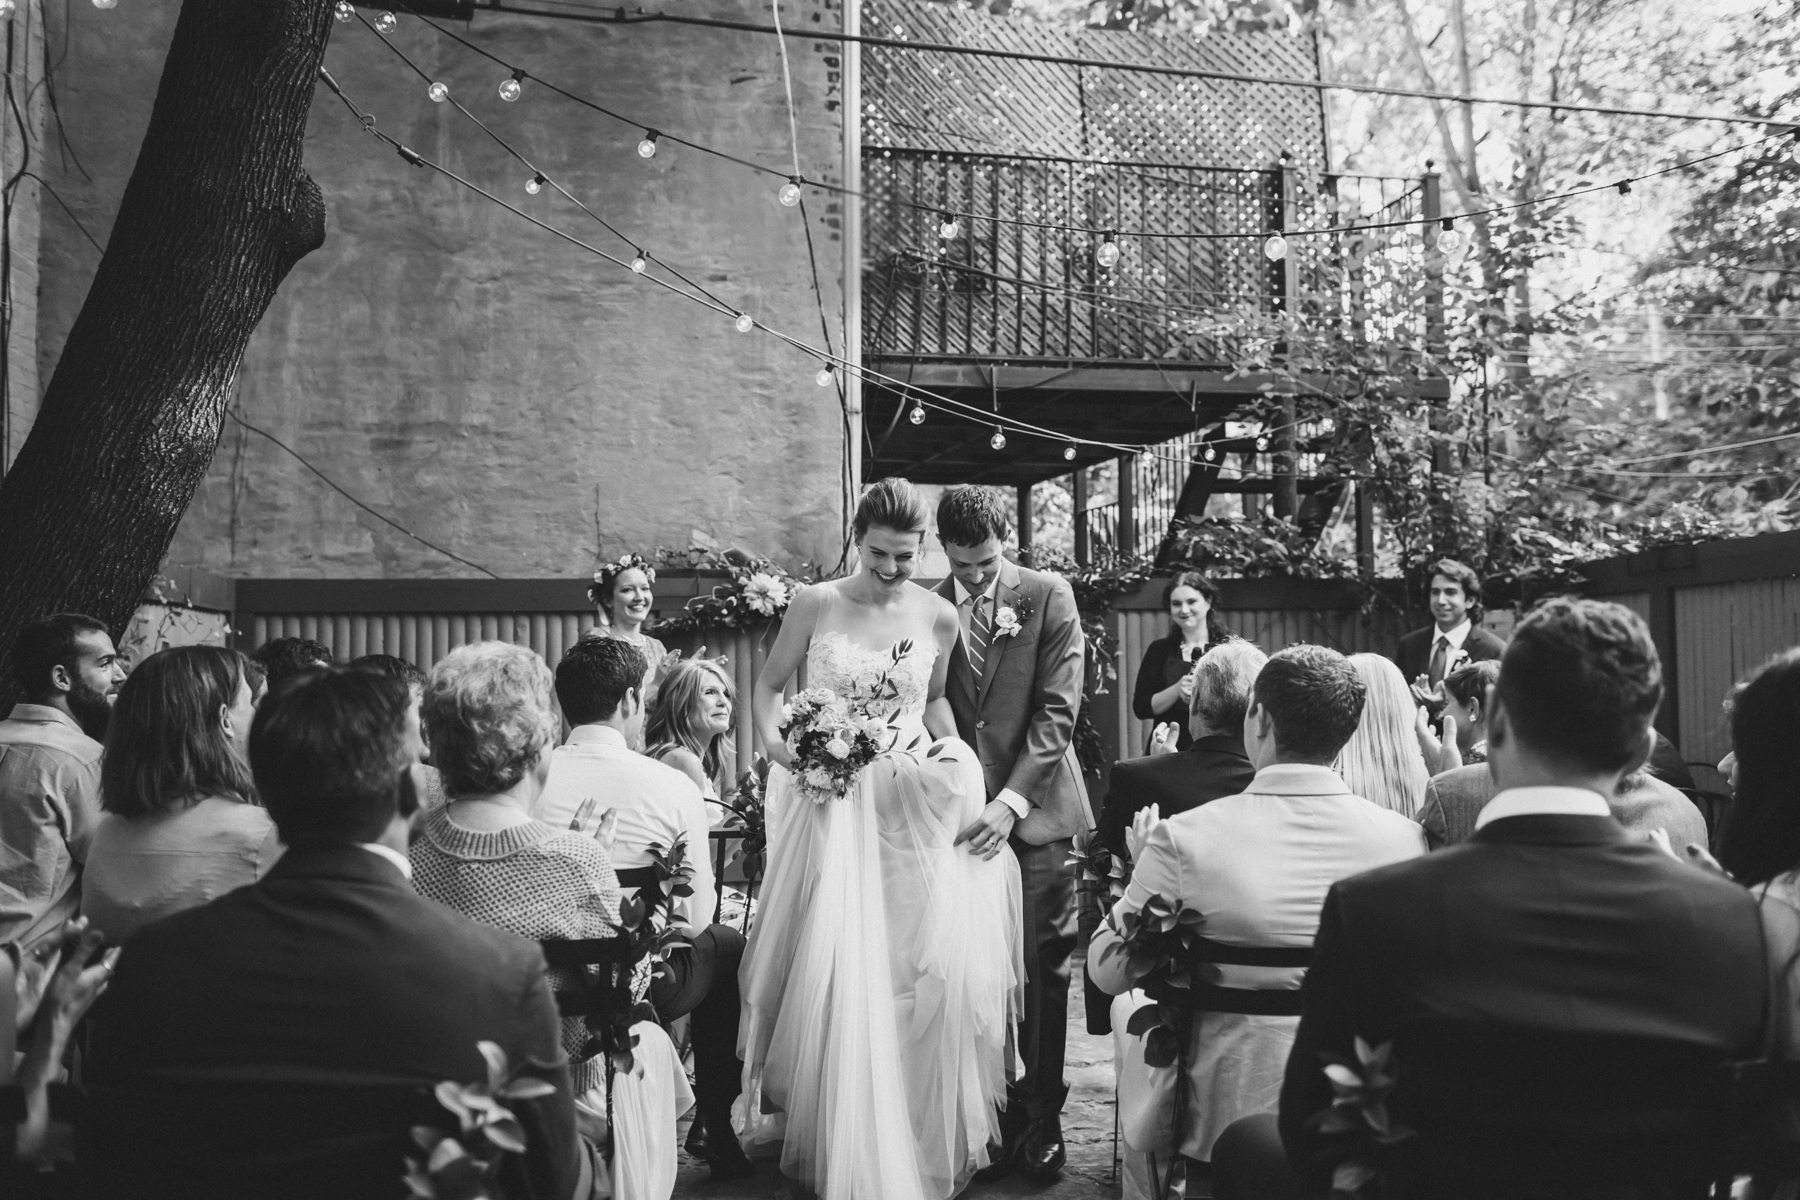 ICI-Restaurant-Fort-Greene-Brooklyn-Intimate-Documentary-Wedding-Photography-Elvira-Kalviste-46.jpg